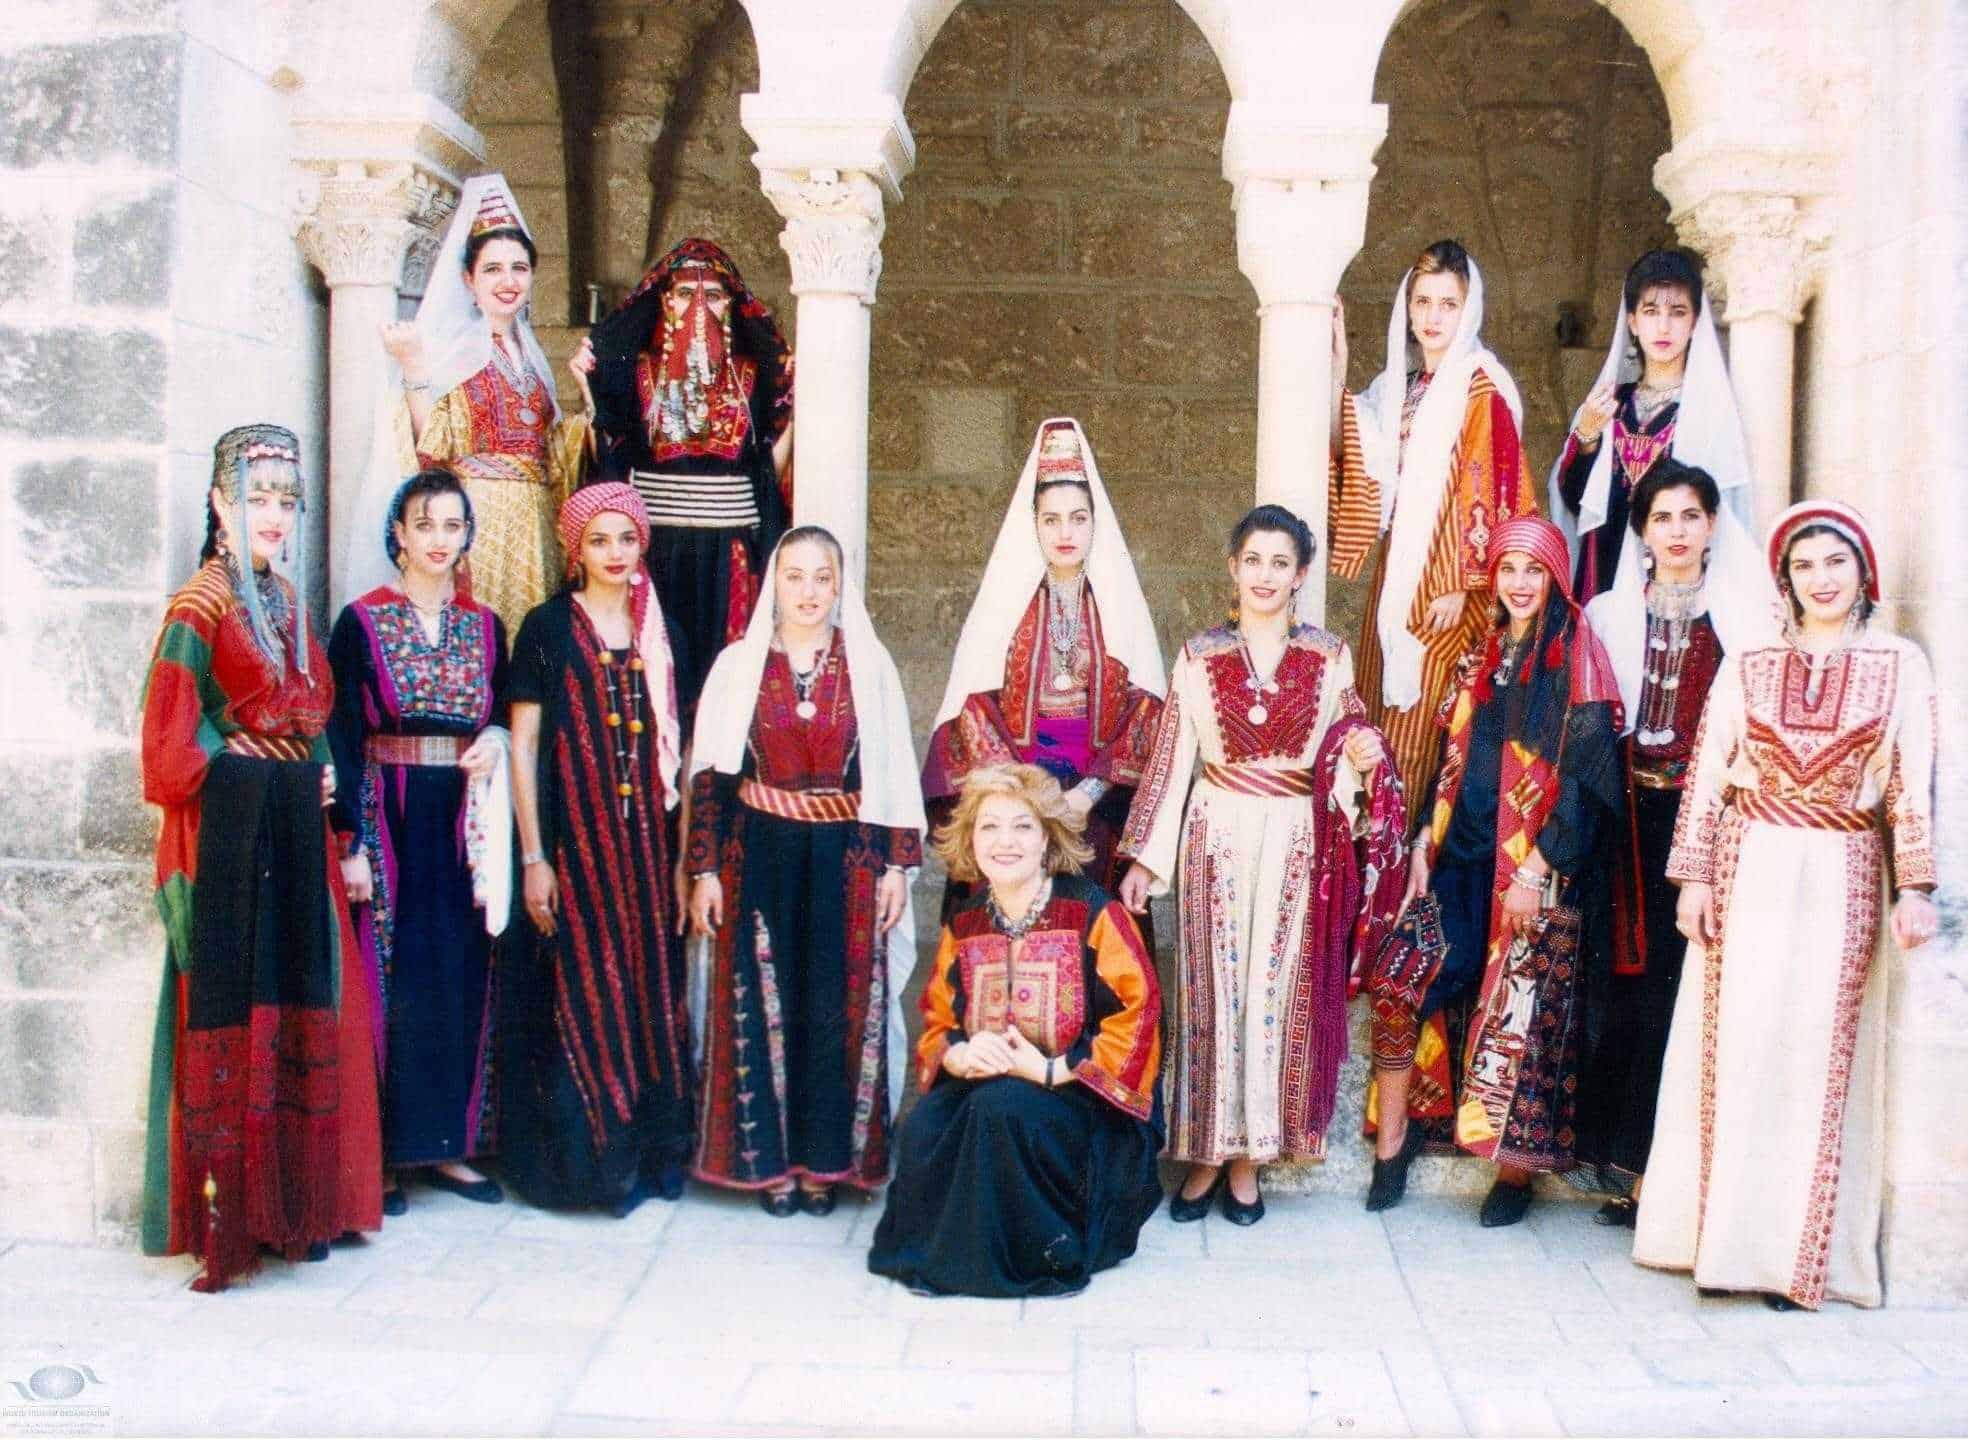 فستان زفاف عروس فلسطين